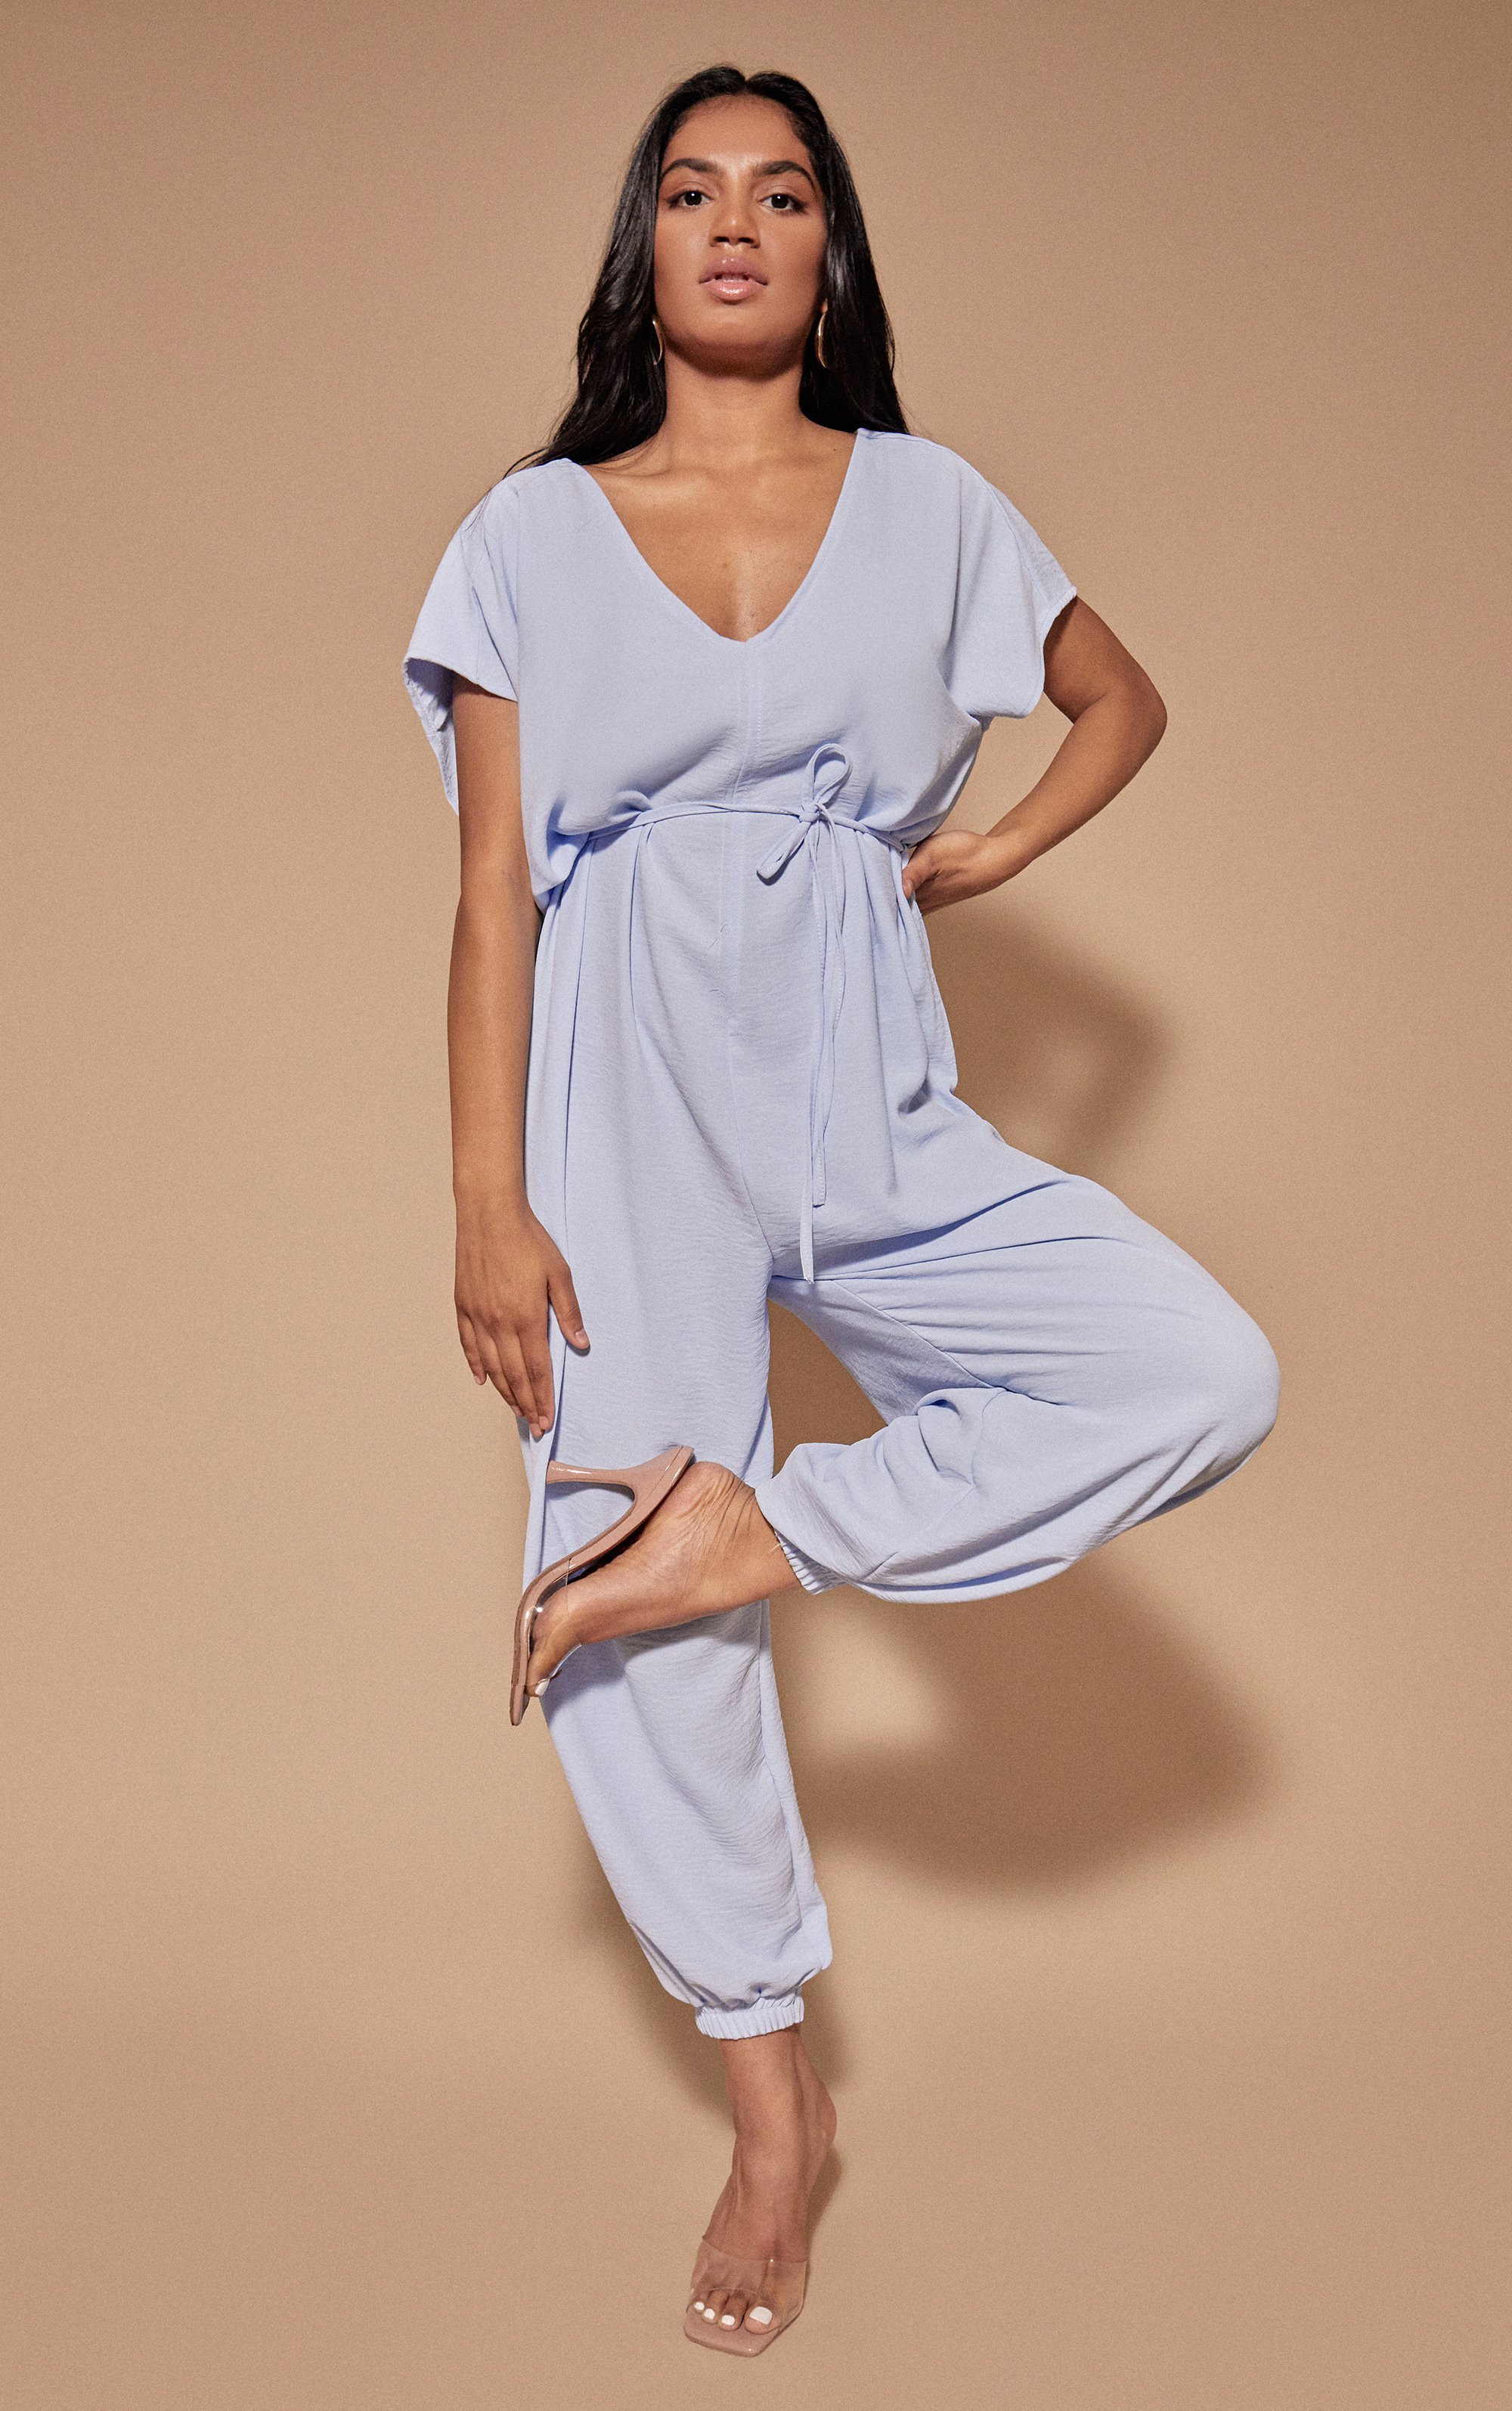 Harem Tie Waist Jumpsuit - Baby Blue / One Size (8-12)